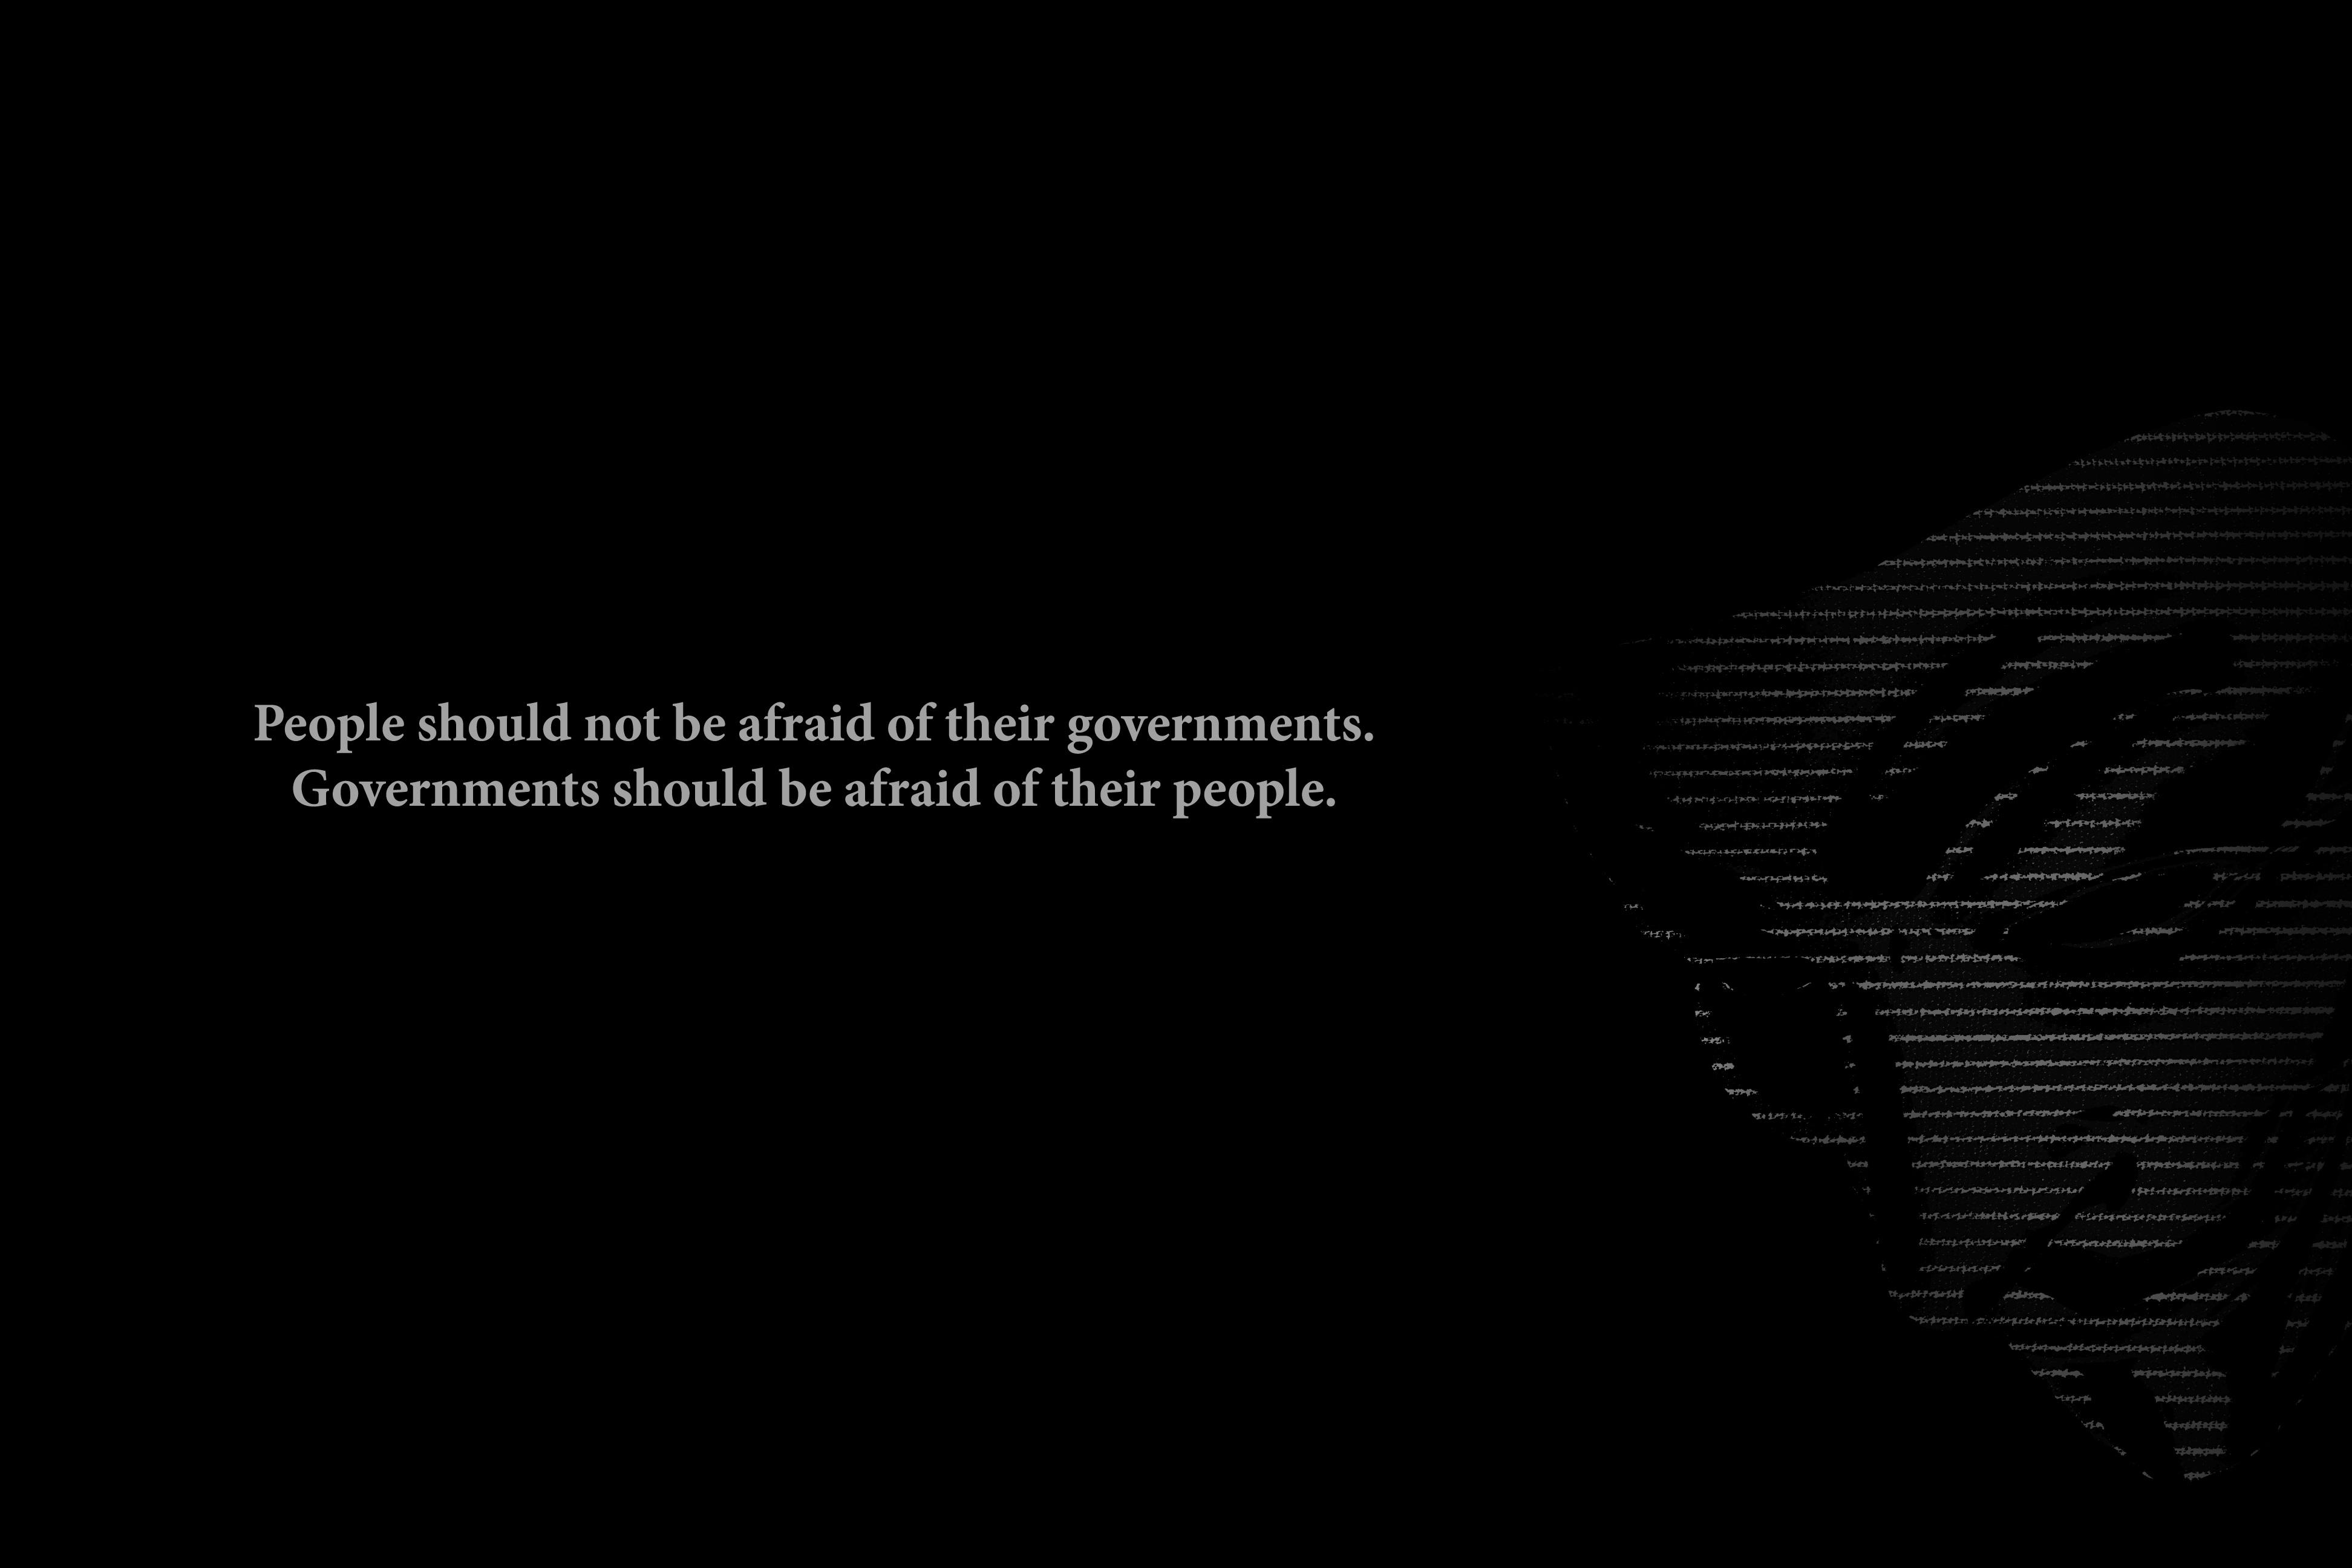 V for Vendetta Essay Quotes